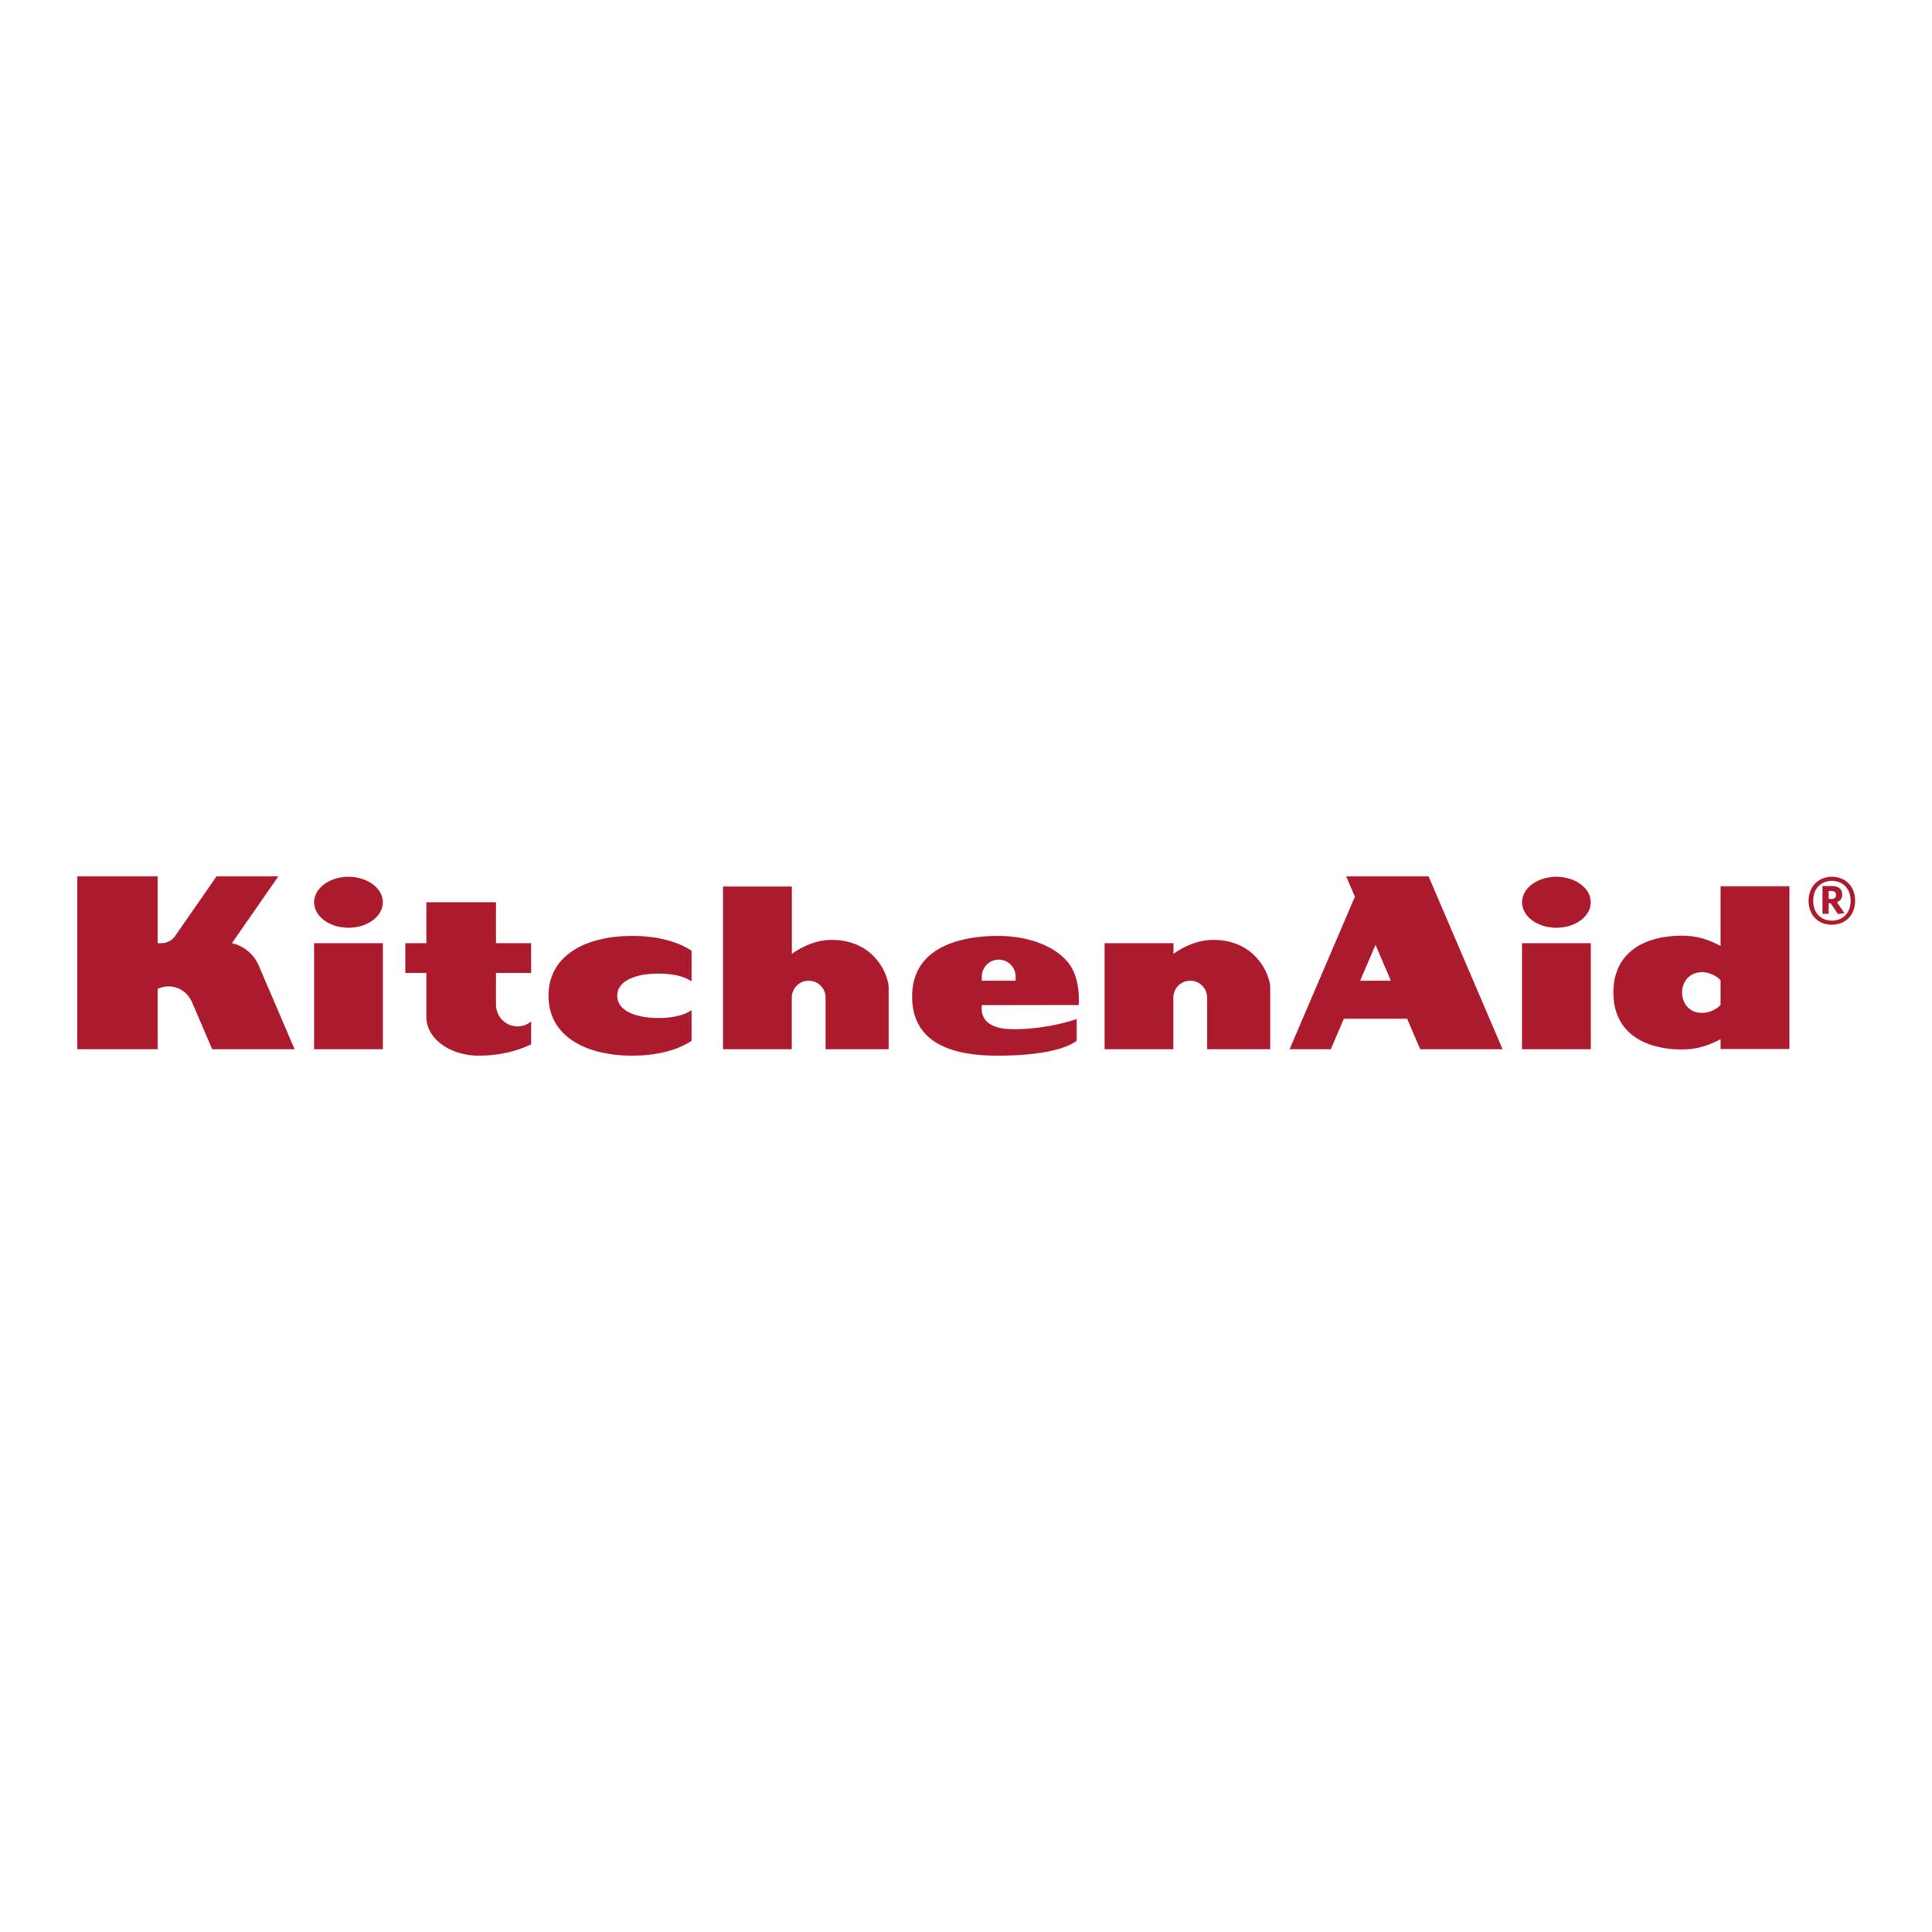 Whirpool_under Kitchenaid.png